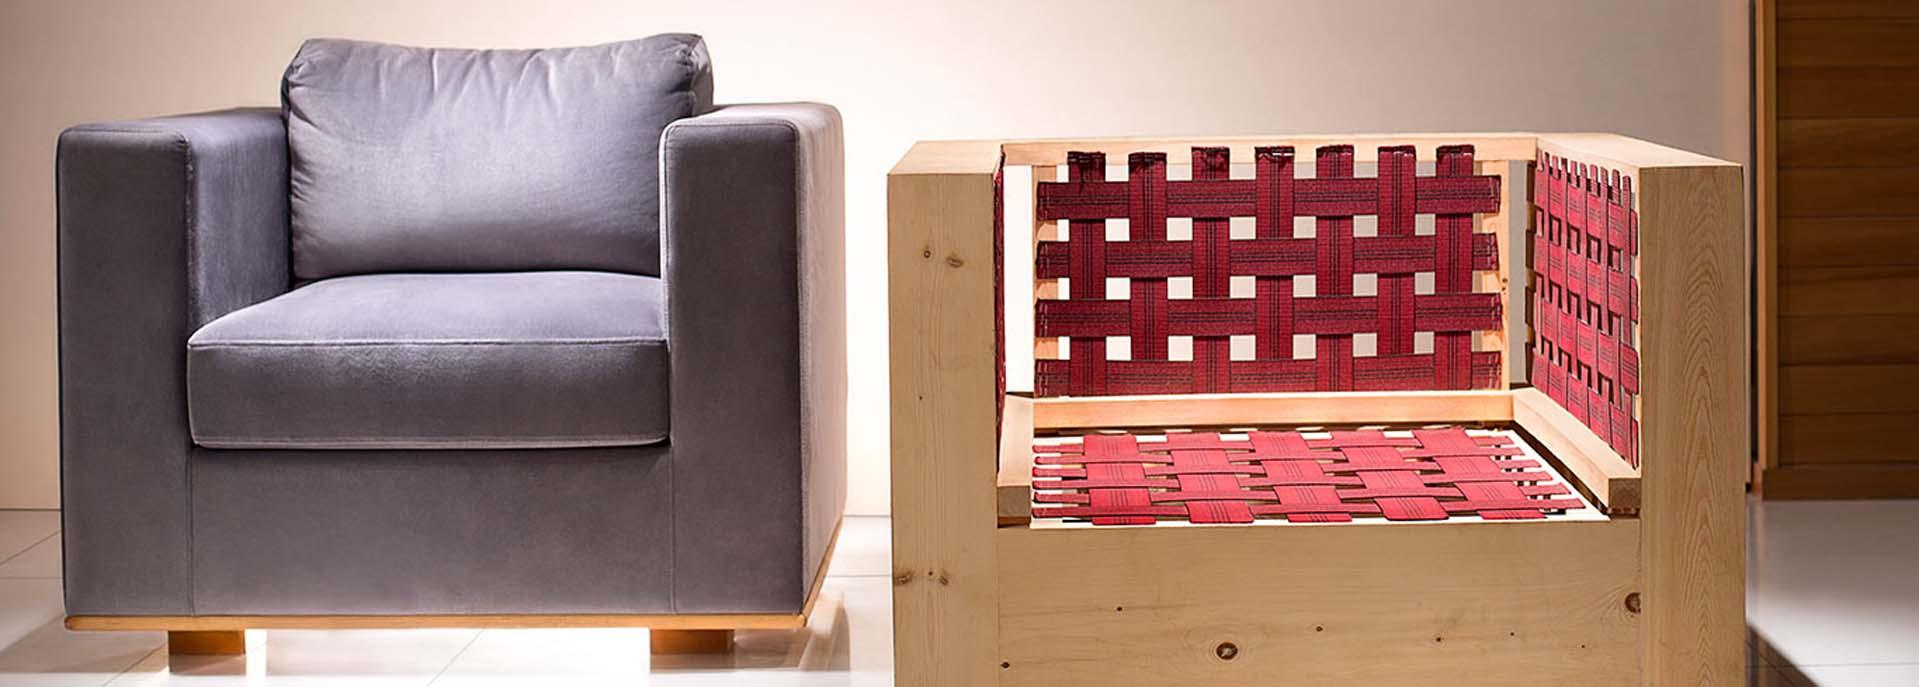 Spruce Pine FirSofa Chair